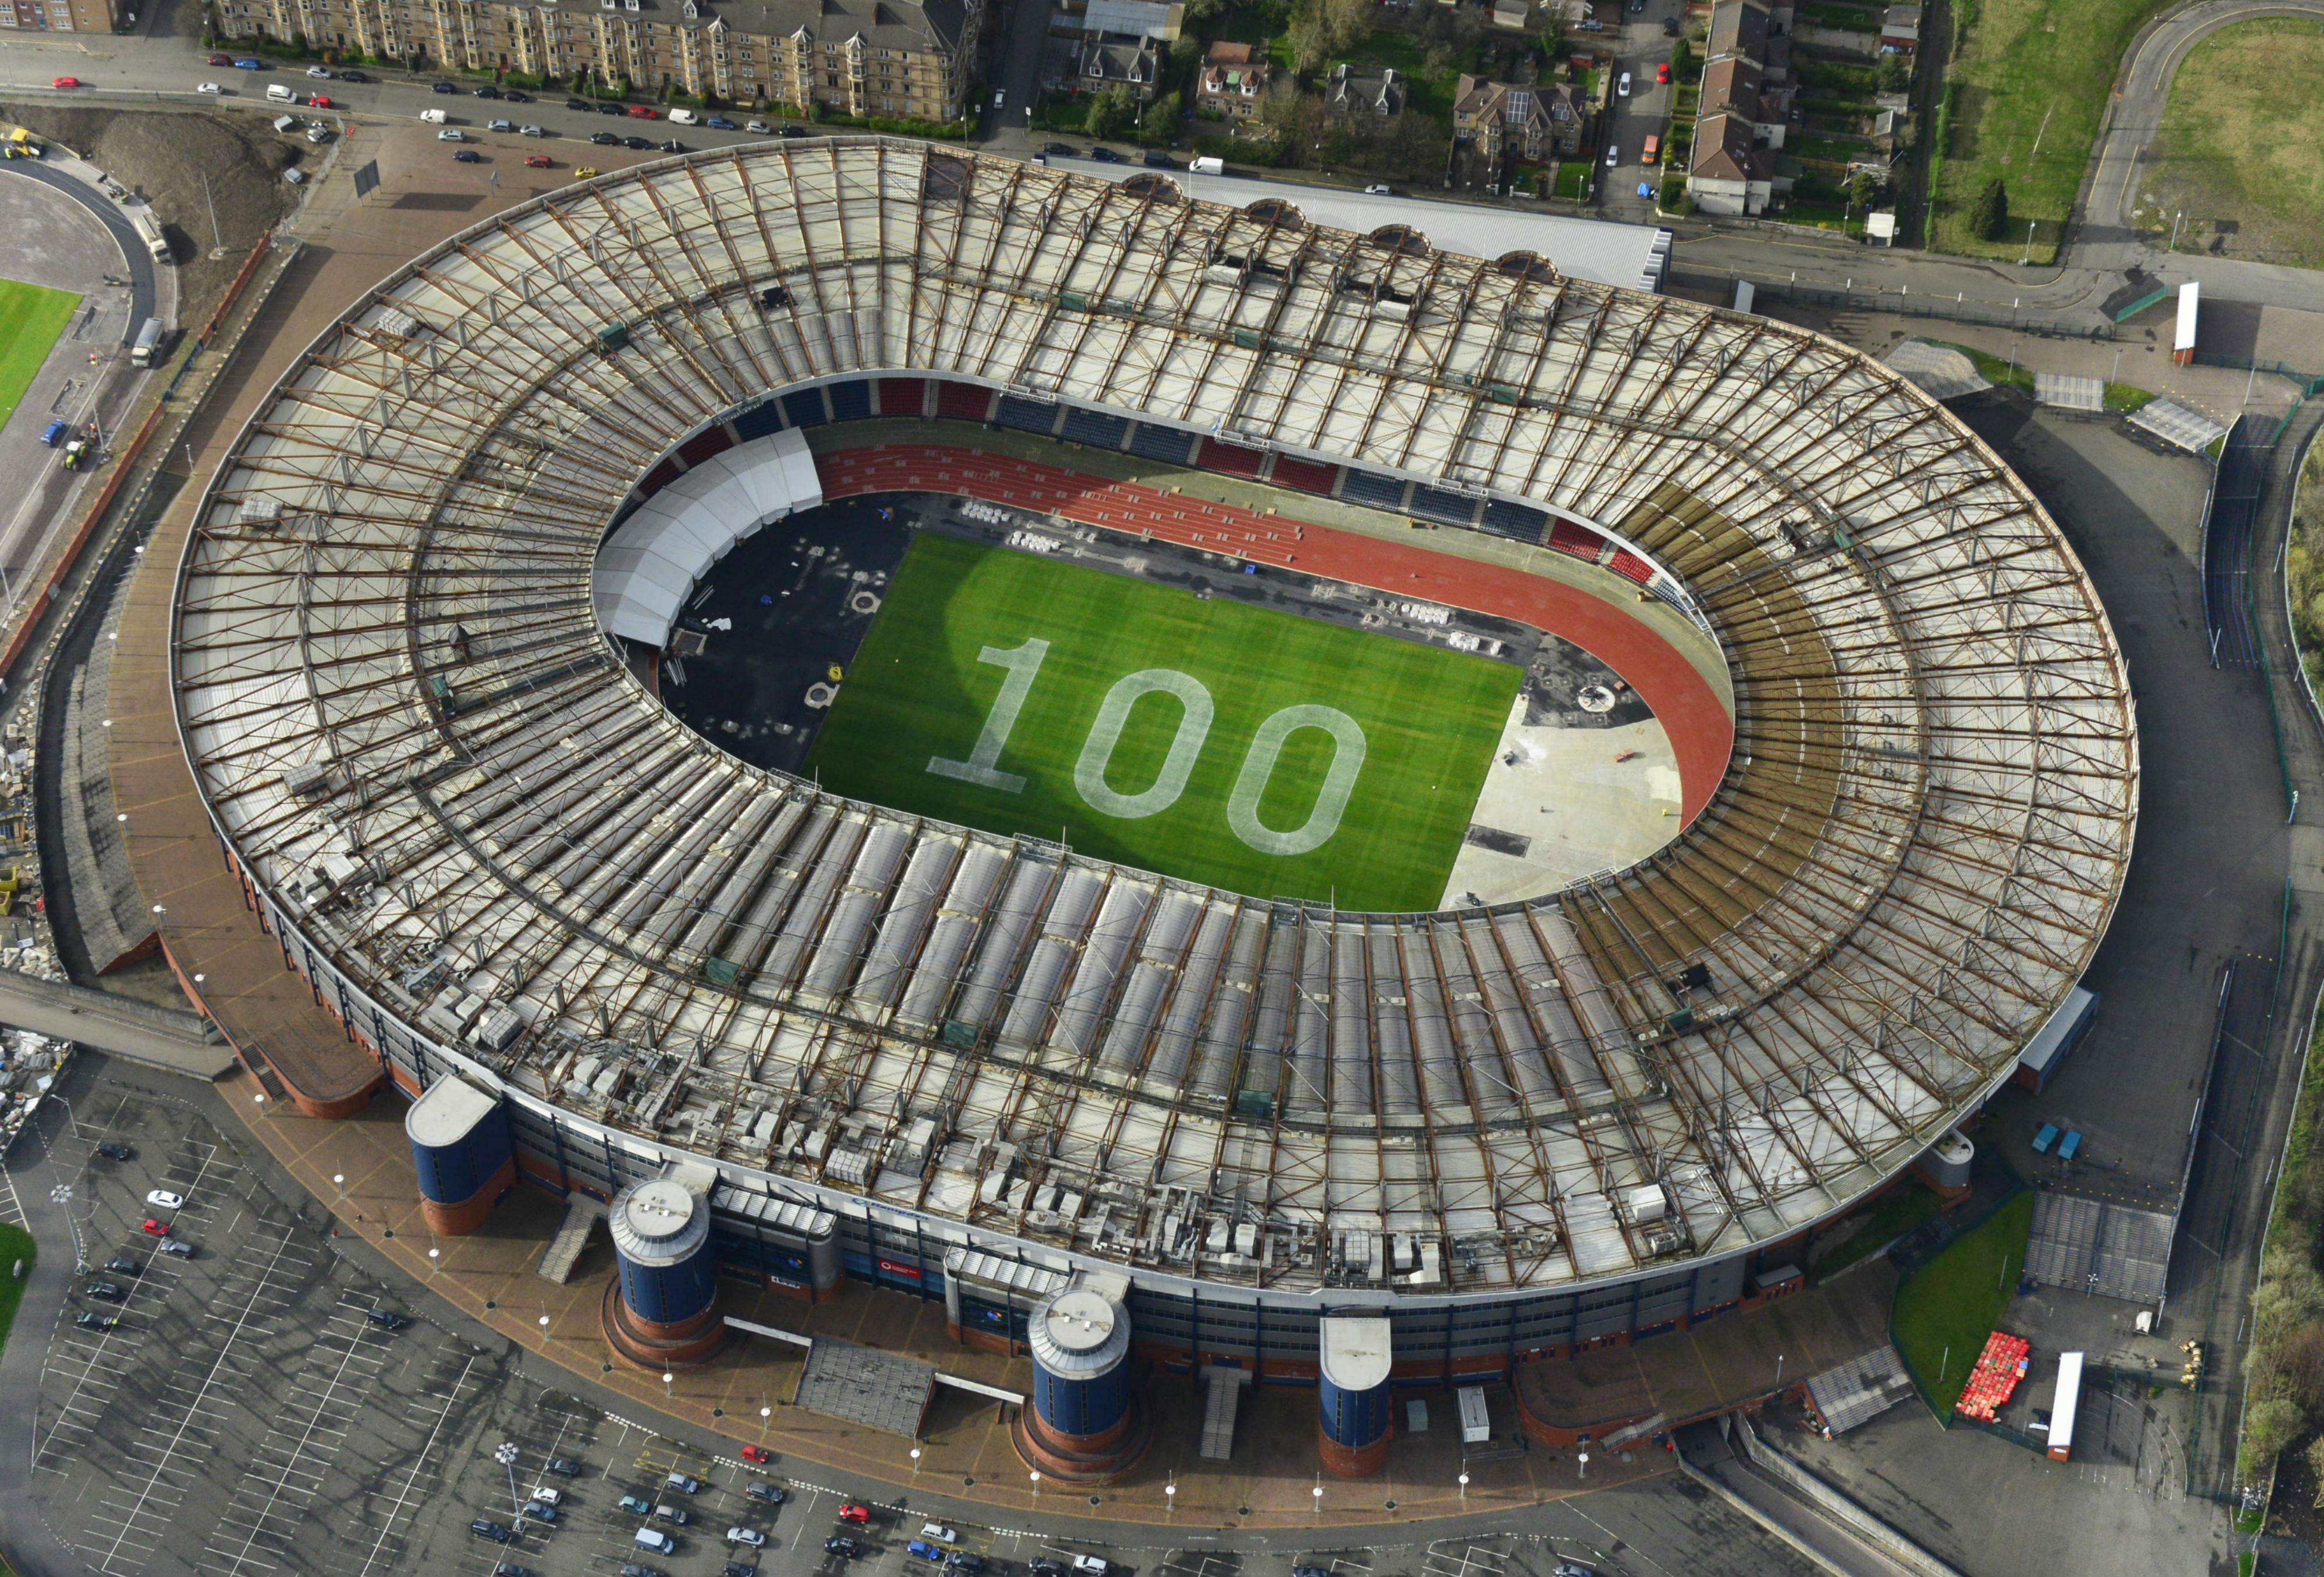 Hampden Stadium celebrates 100 days to go before the XX Commonwealth Games